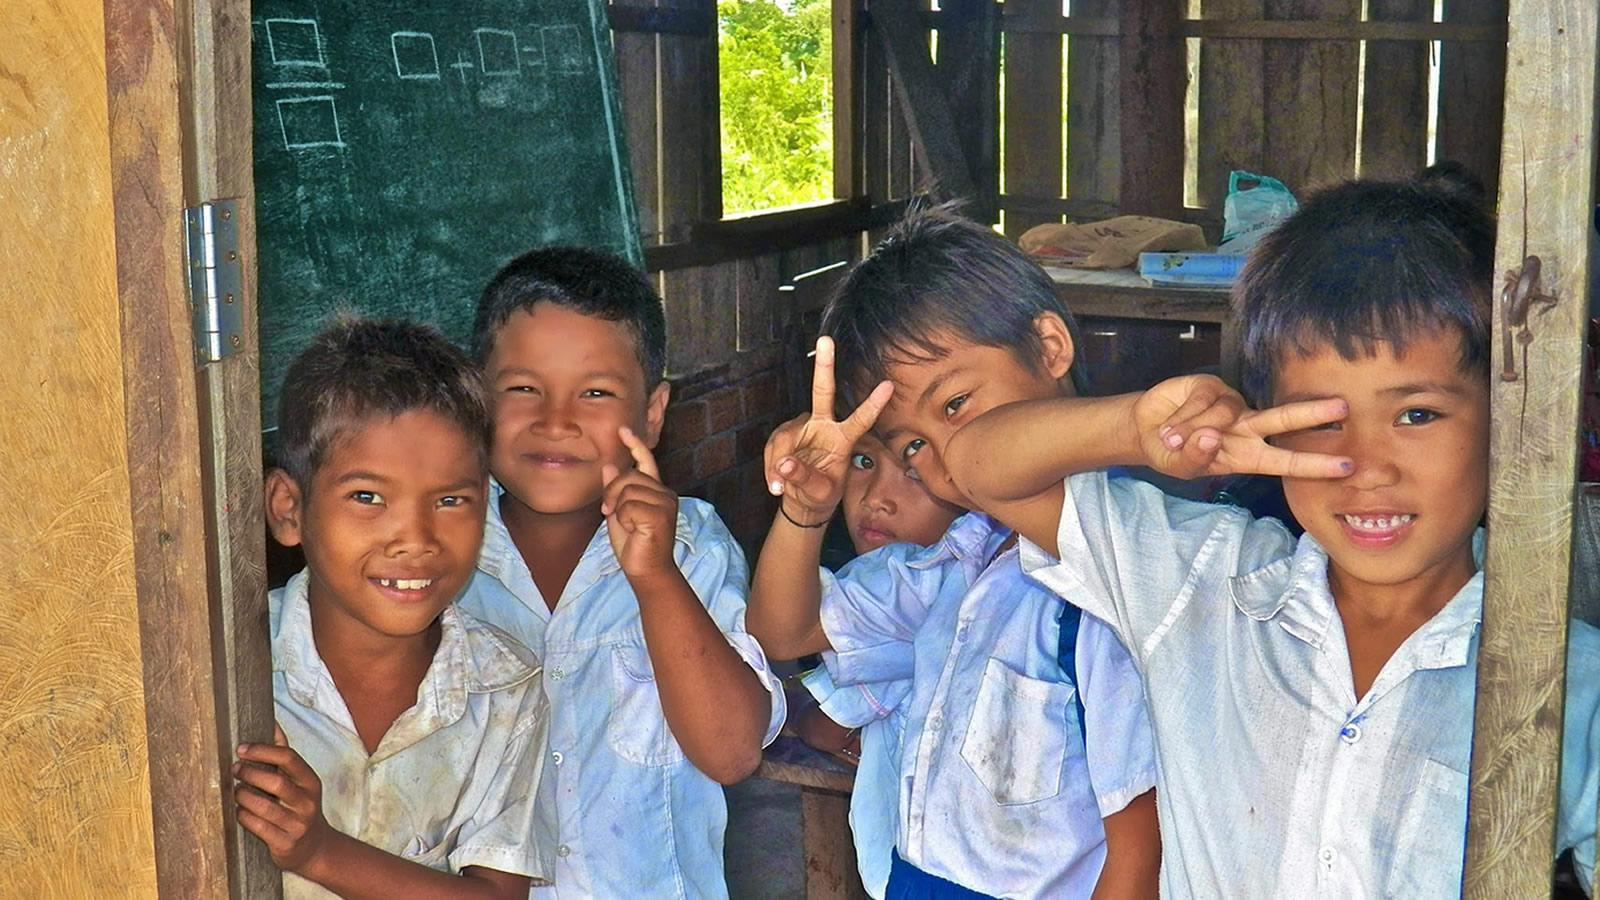 Cambodian Schoolchildren Smiling in Front of a Chalkboard